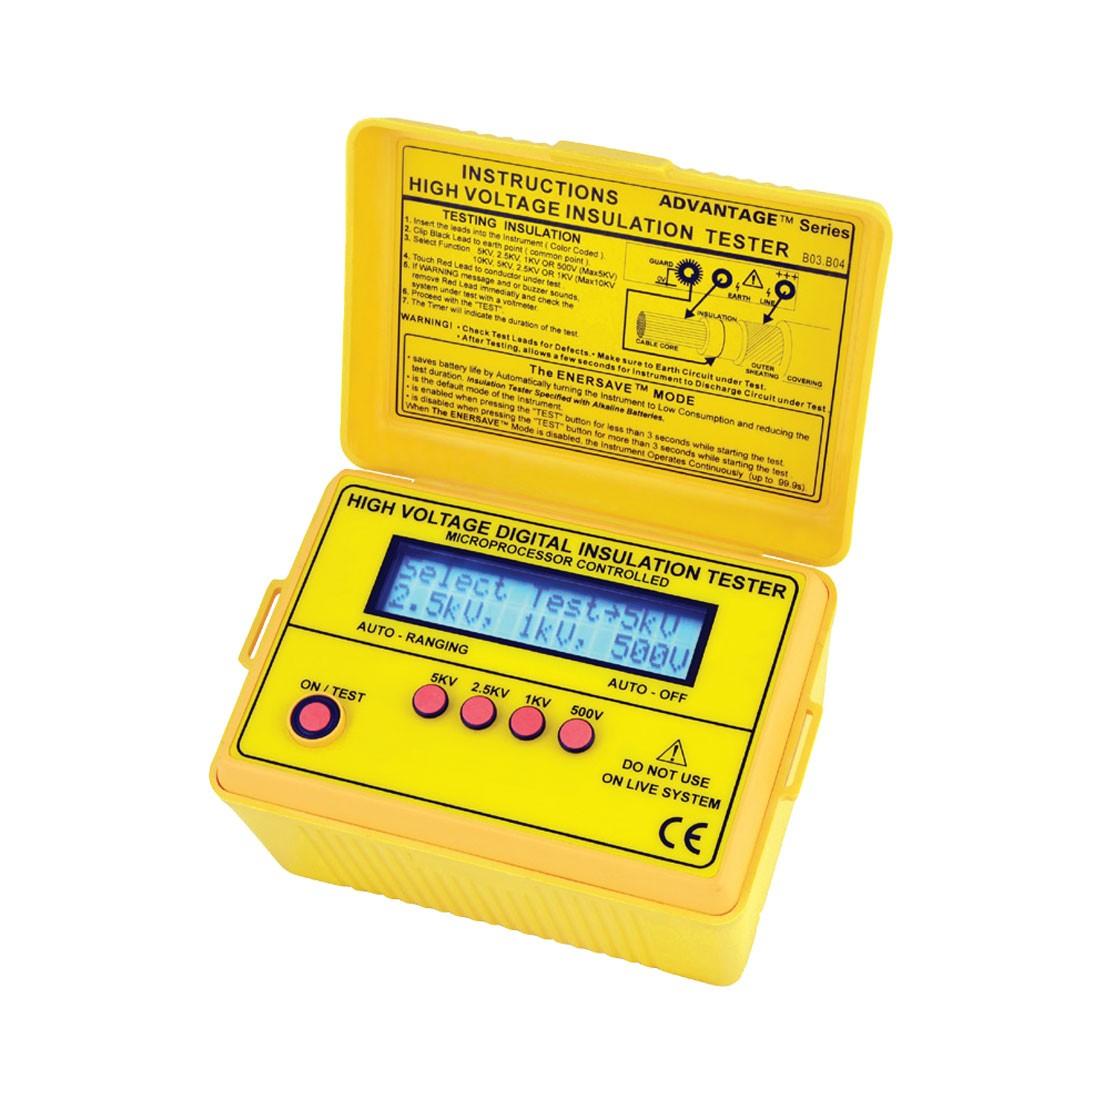 2803IN Digital (Up to 5kV) Insulation Tester